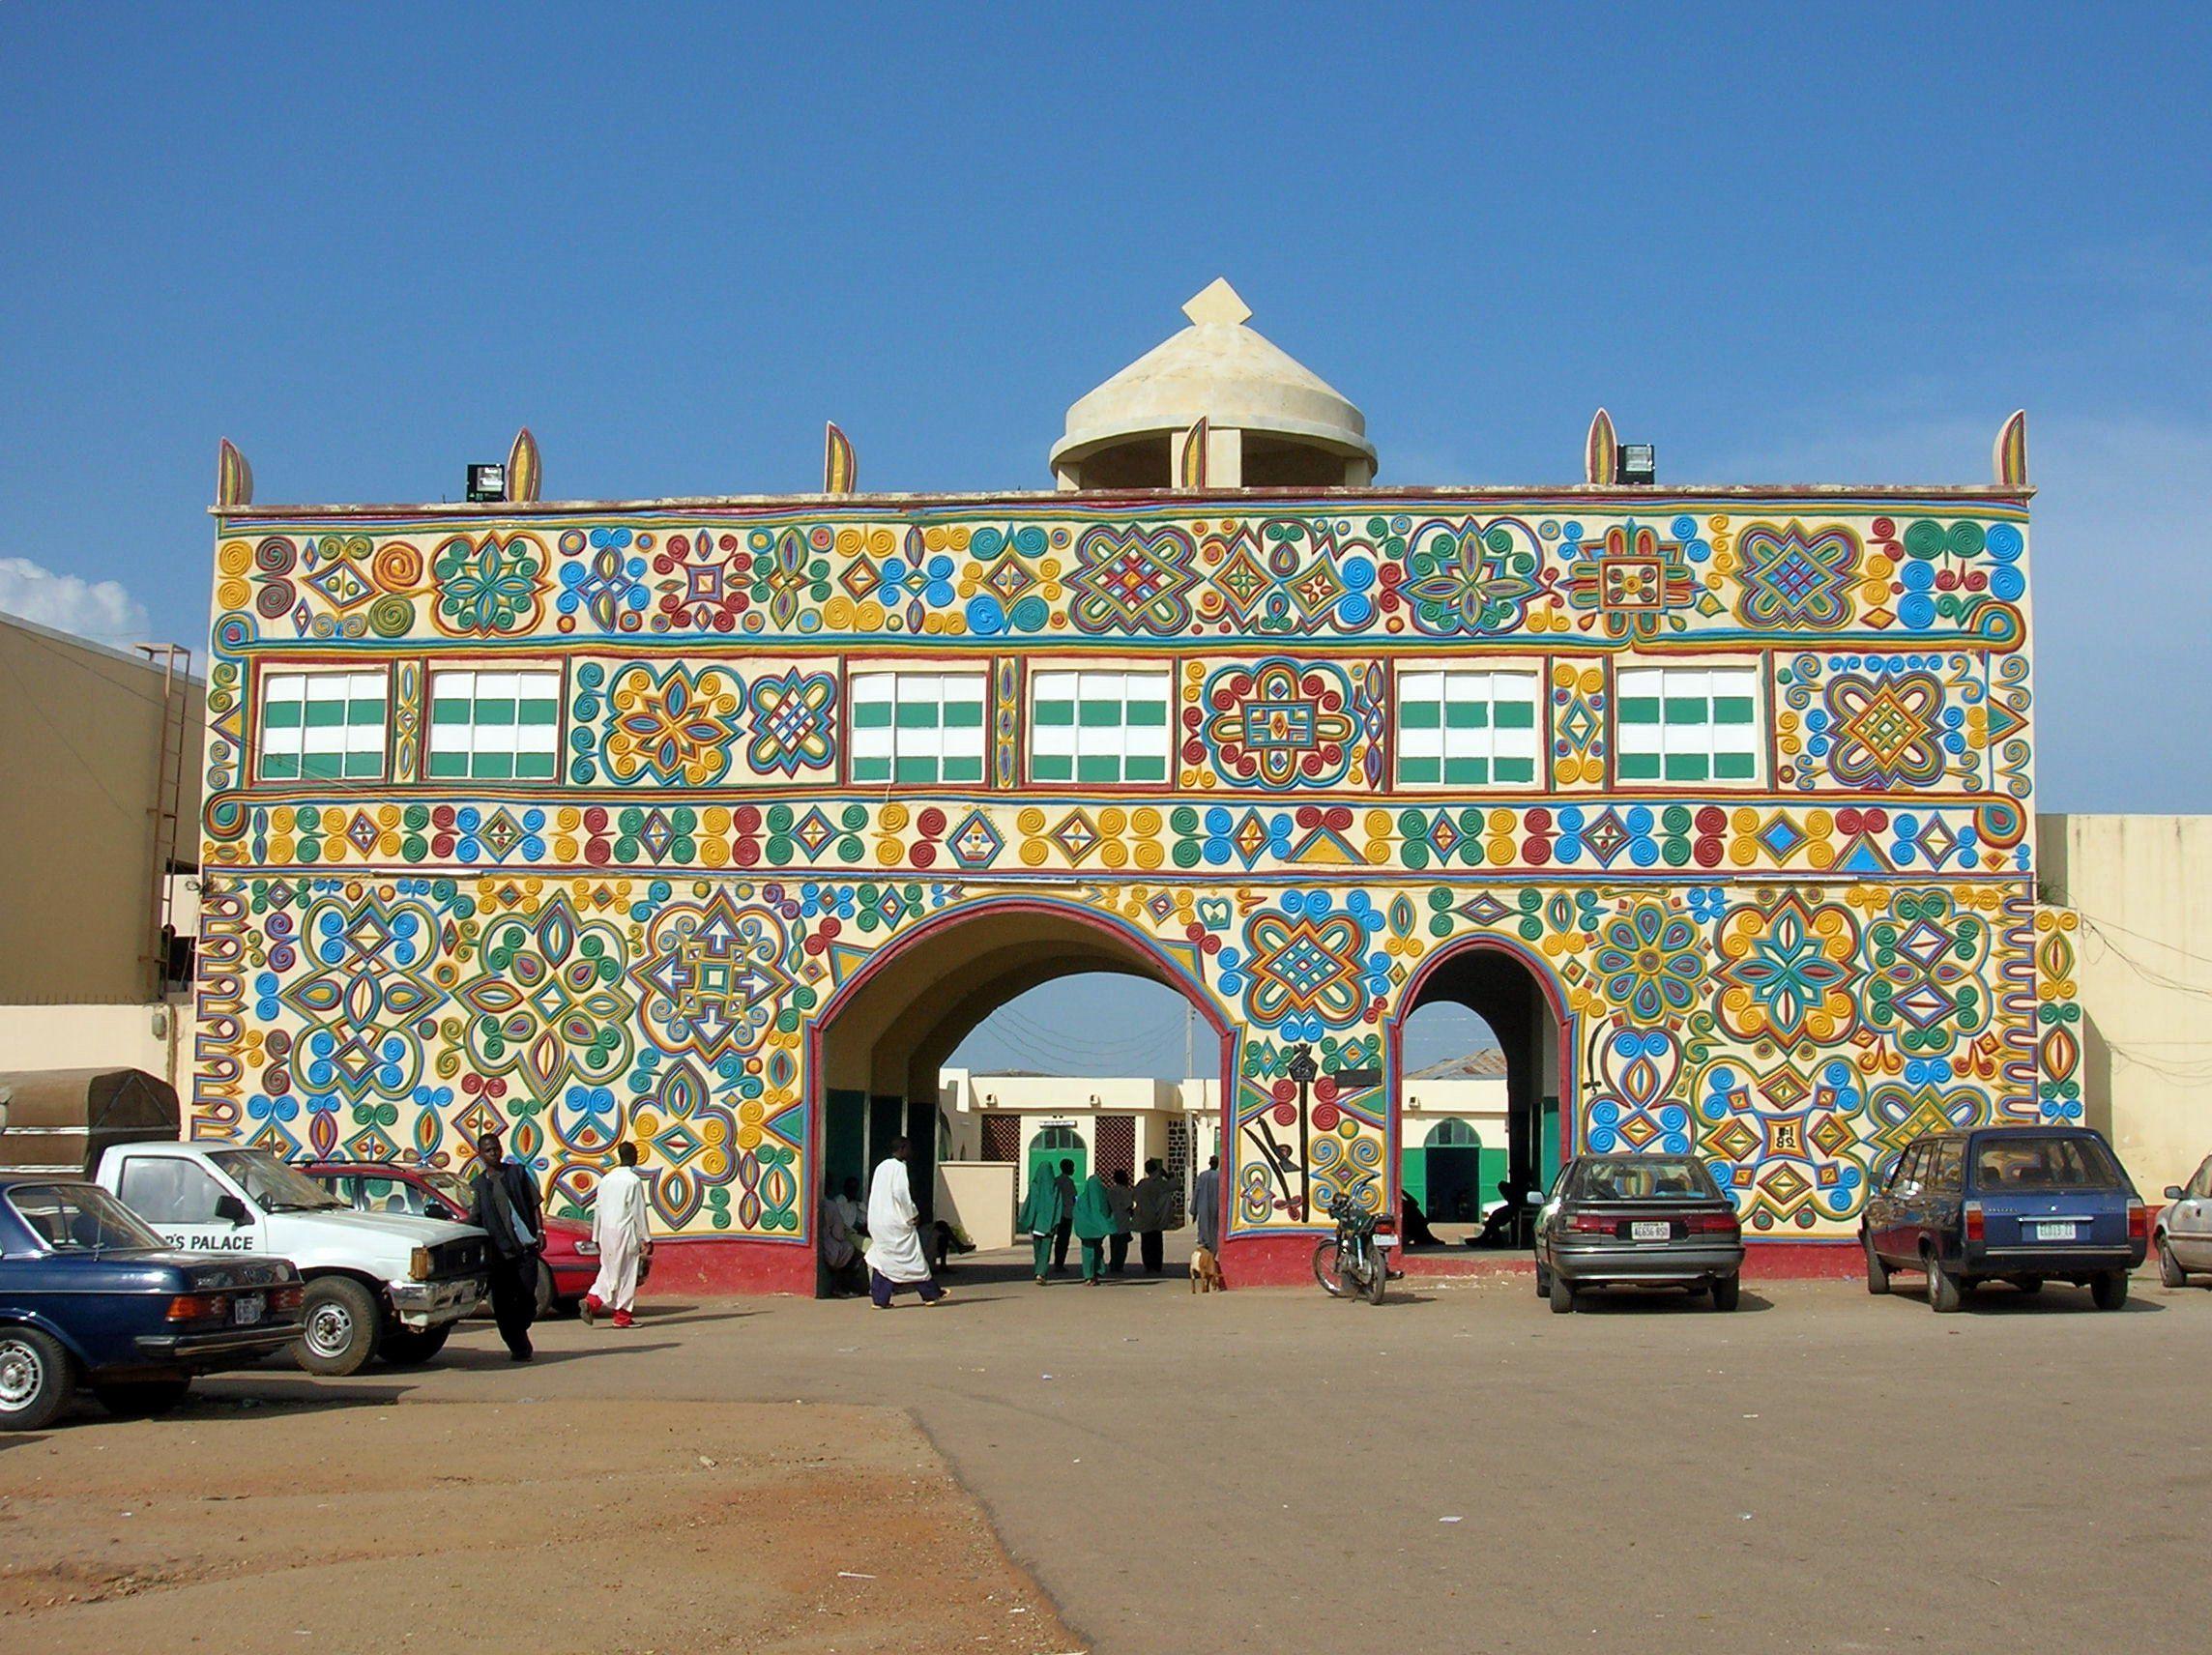 Kanogate gate to the palace of the emir of zazzau zaria a major city in kaduna state in northern nigeria wikipedia the free encyclopedia